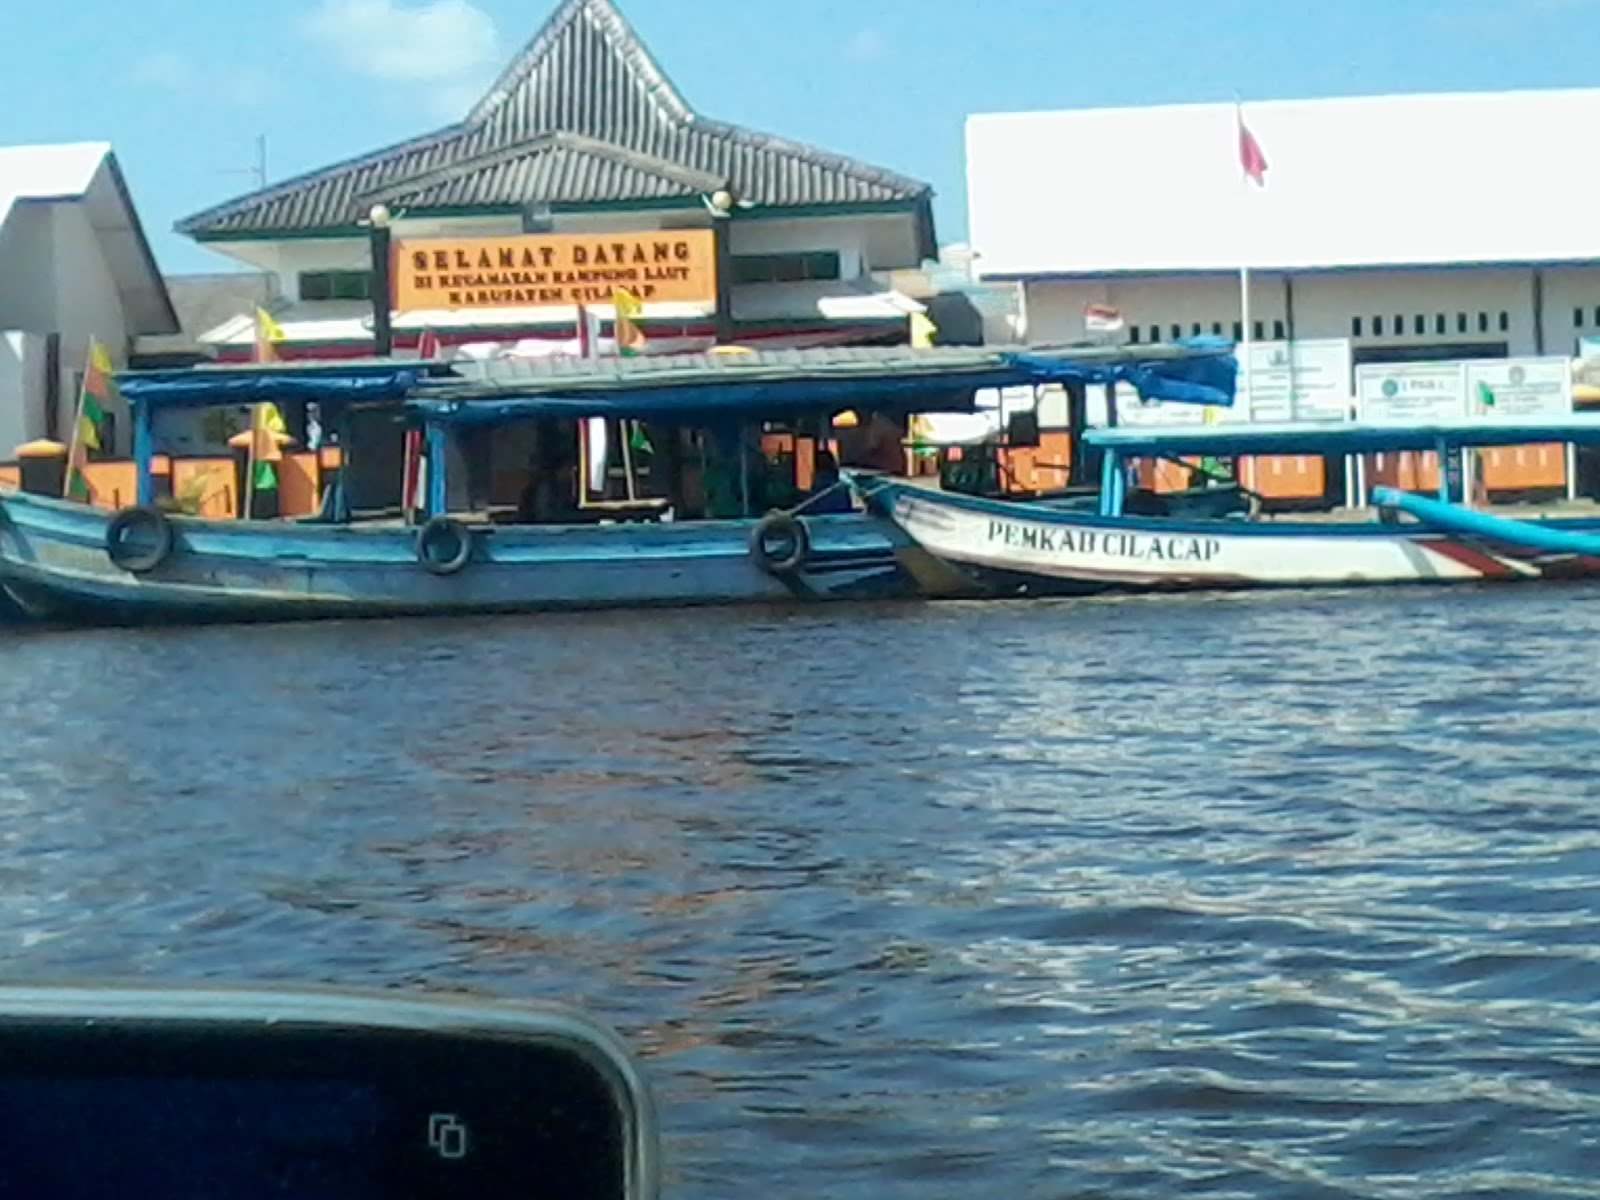 Pesona Kampung Laut Cilacap Tentang Indonesia Kab